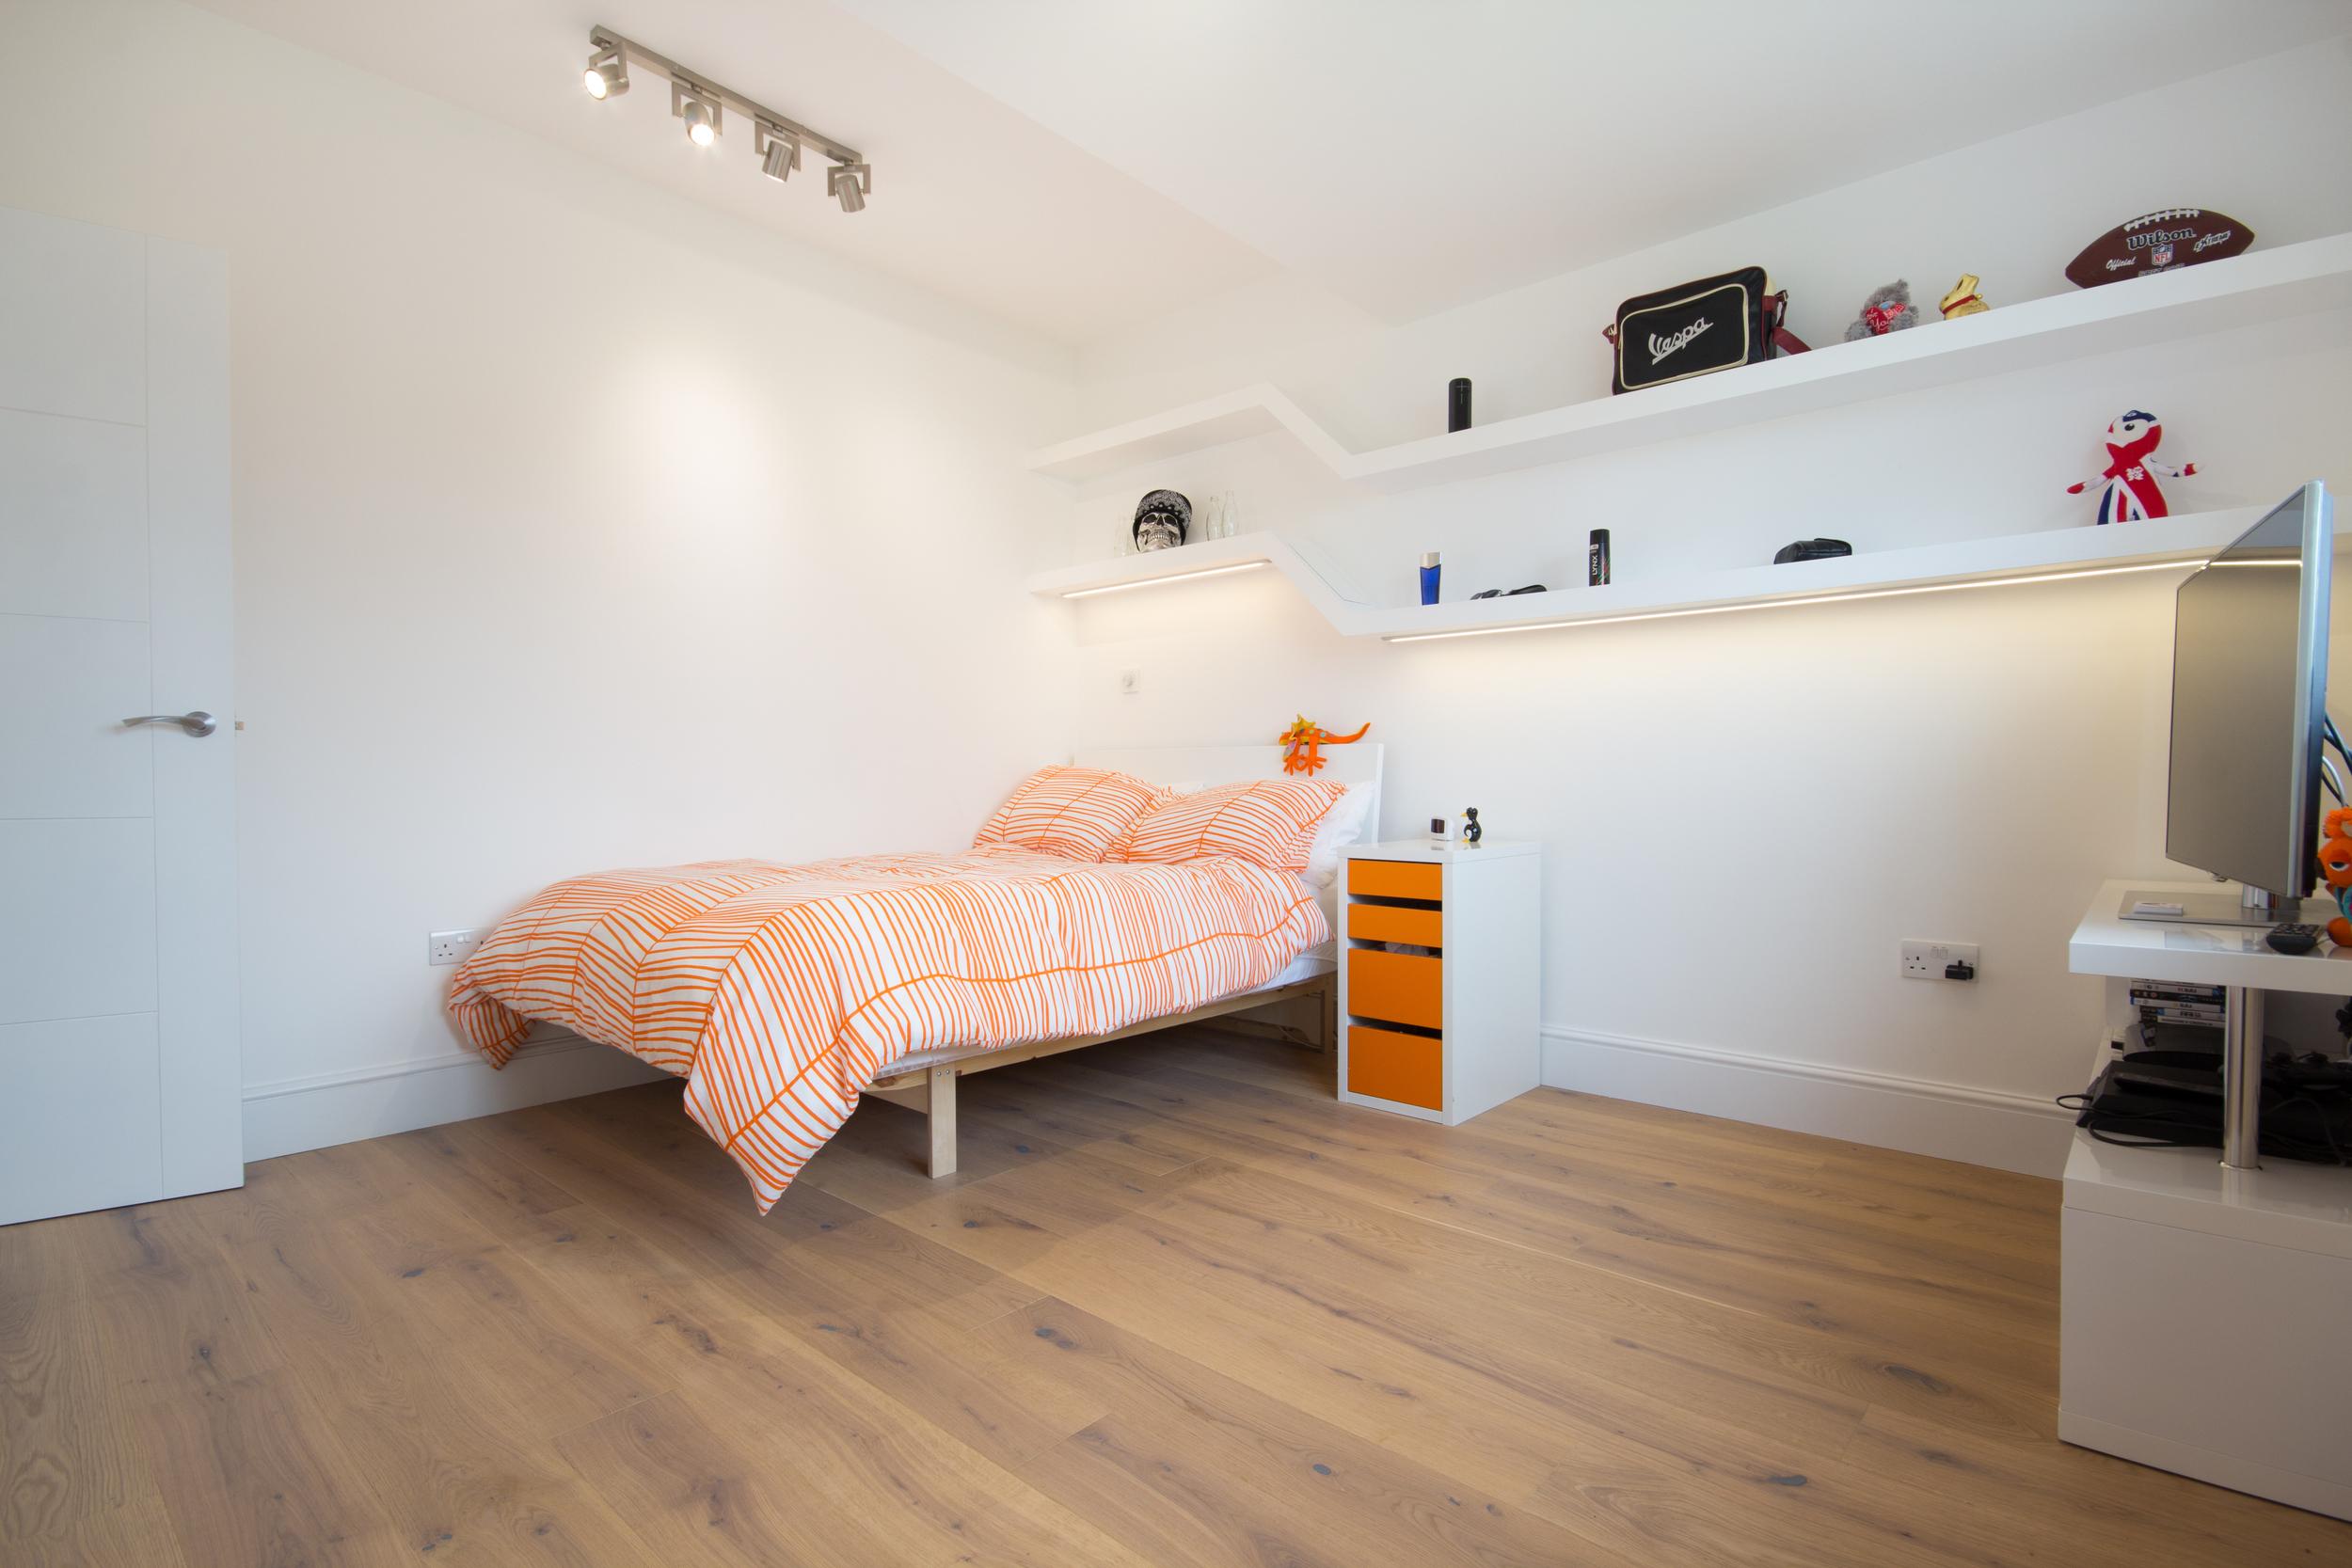 Bed-2297.jpg